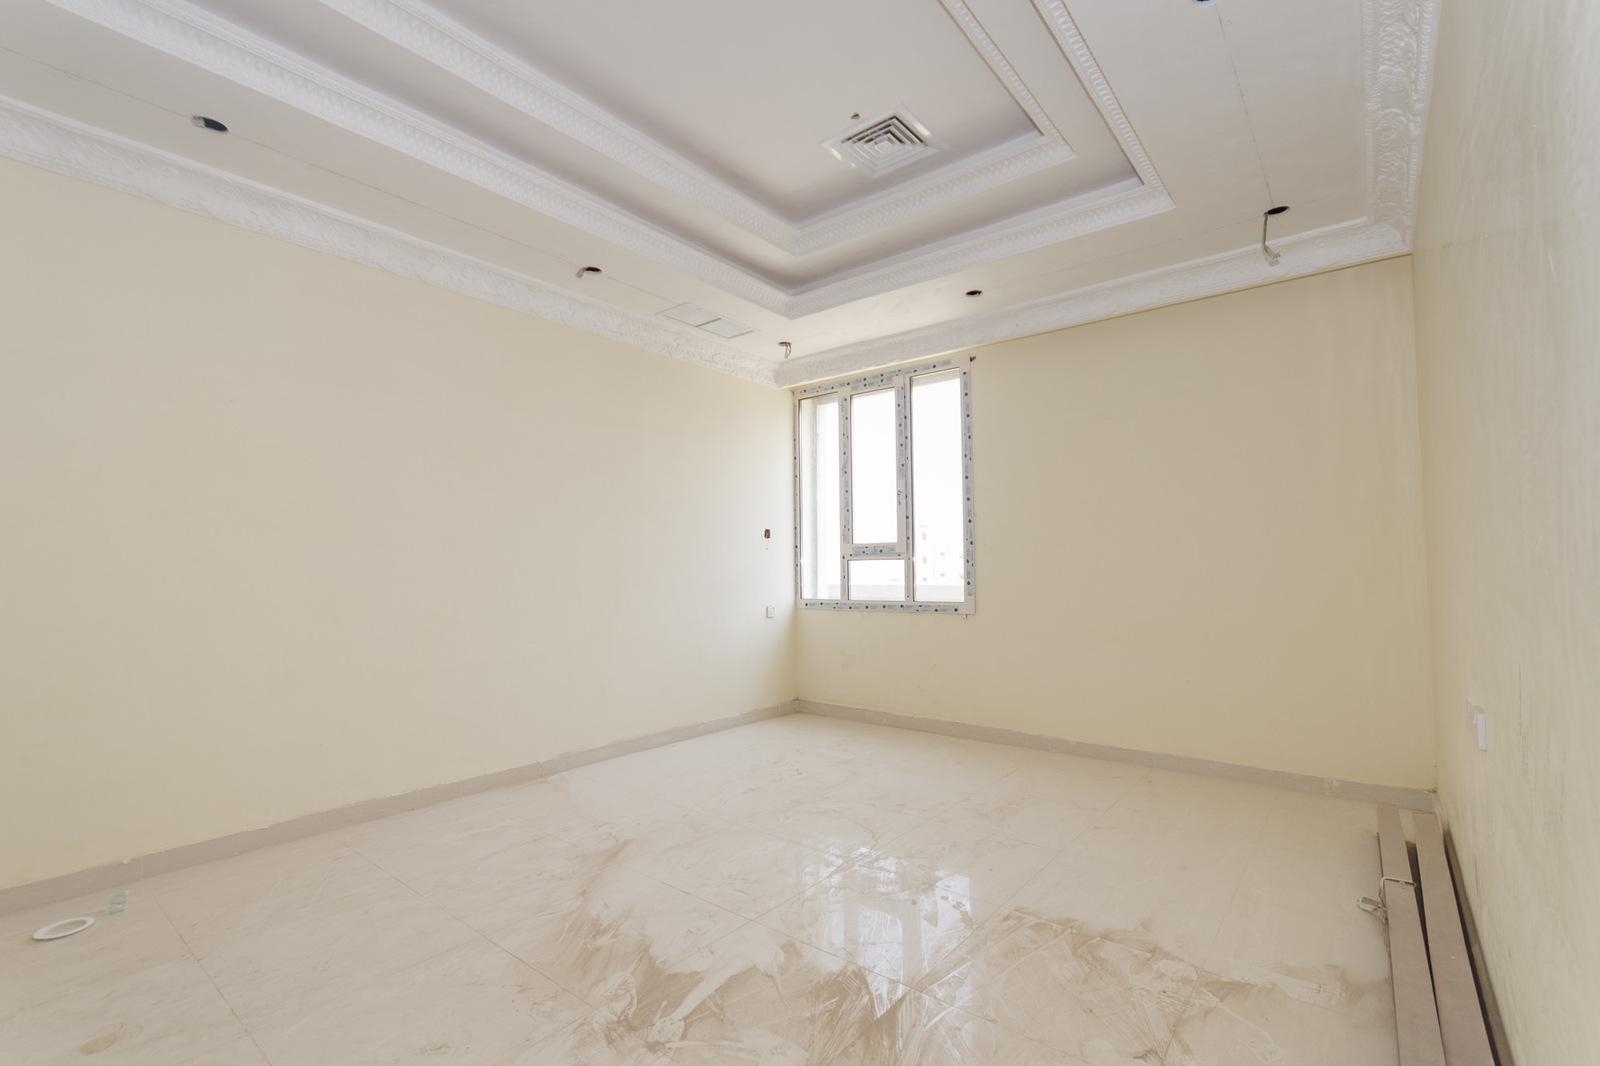 Salwa – new, unfurnished three bedroom apartments